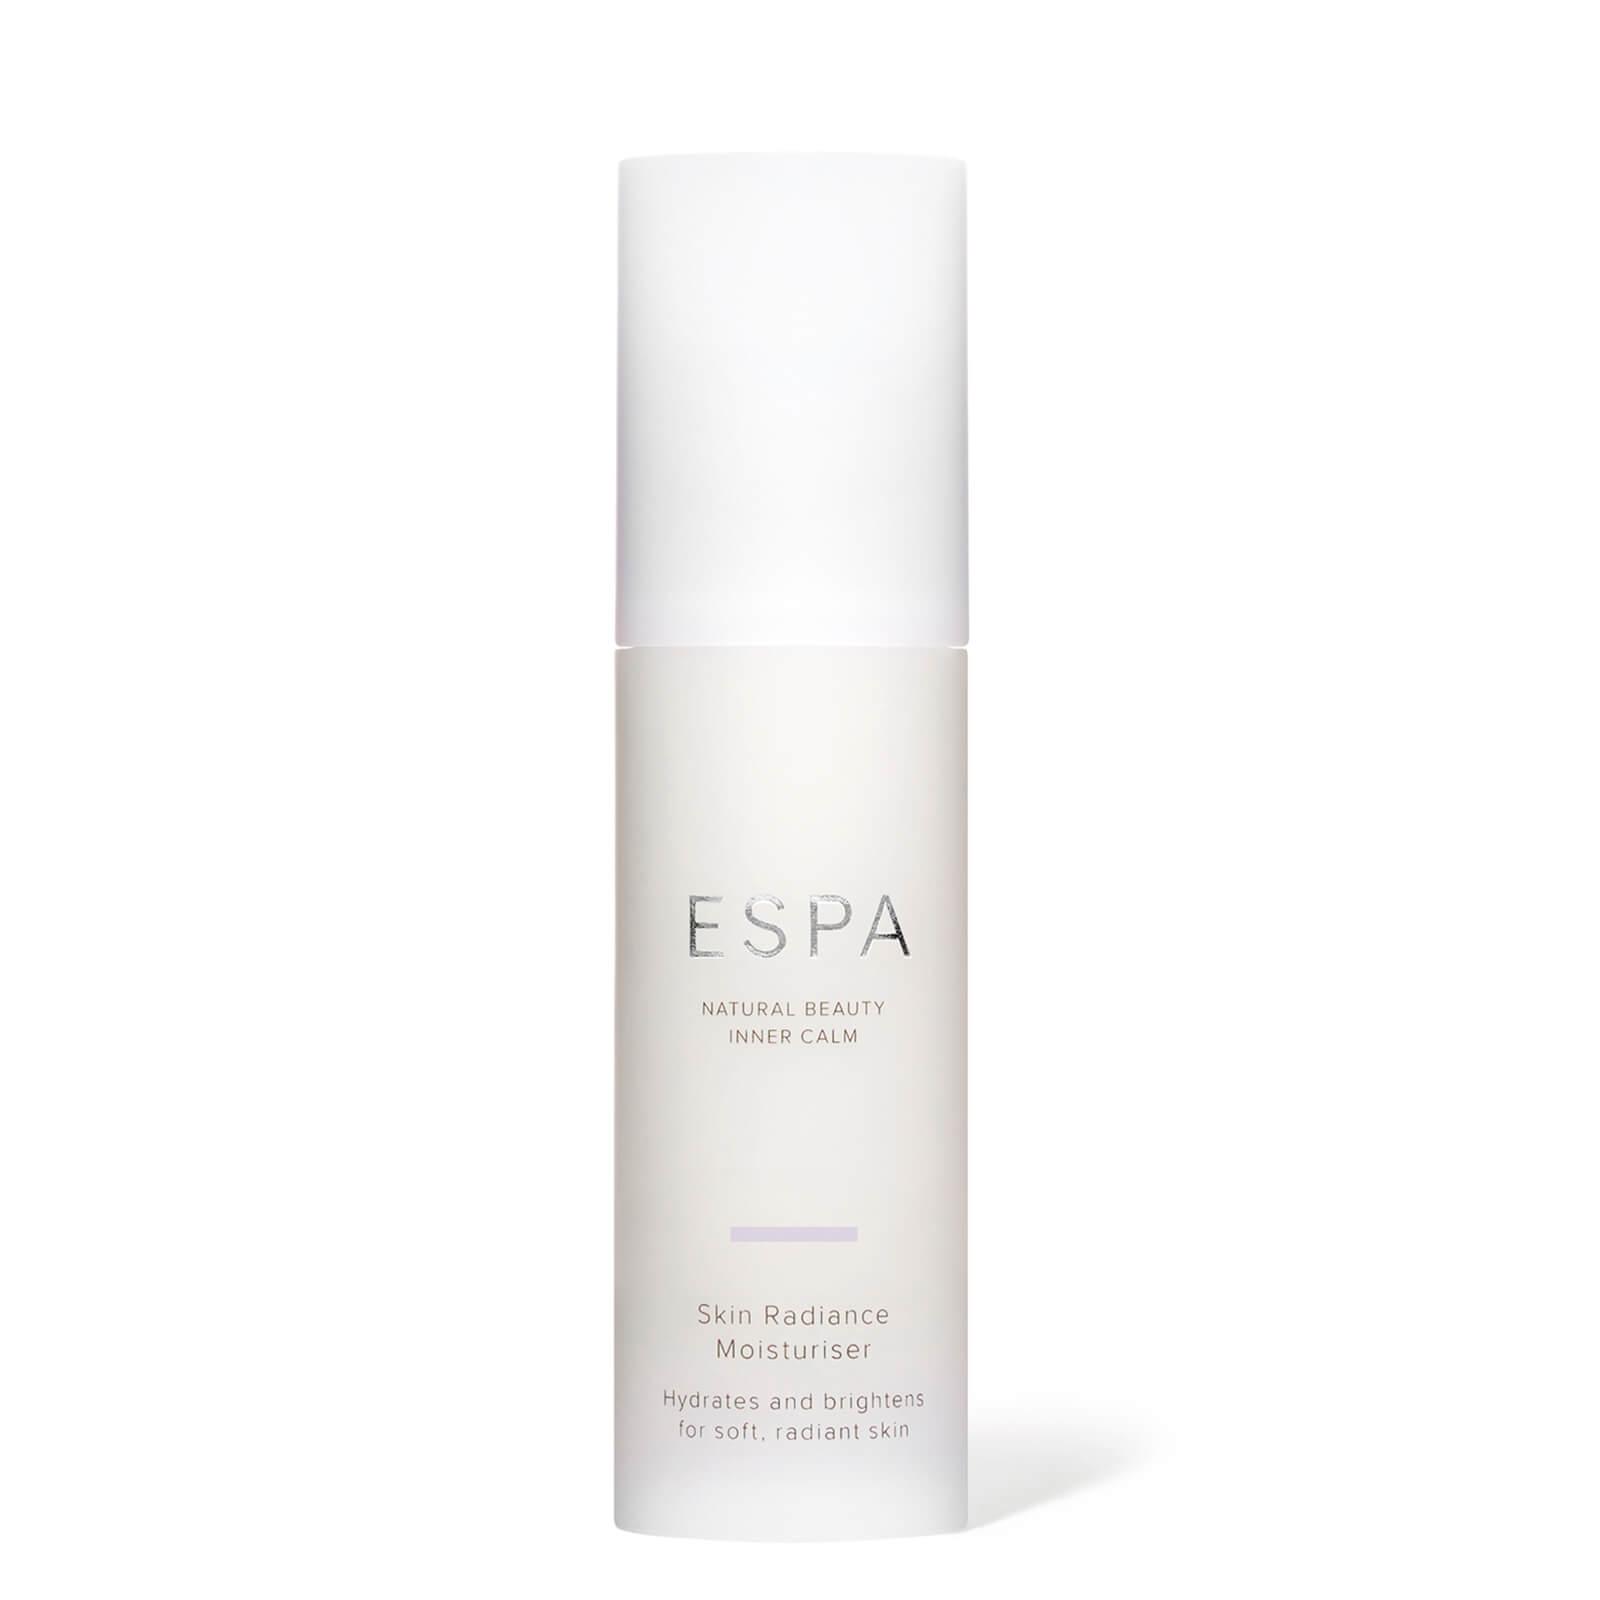 ESPA Hydratant Illuminateur Skin Radiance Moisturiser ESPA 35ml